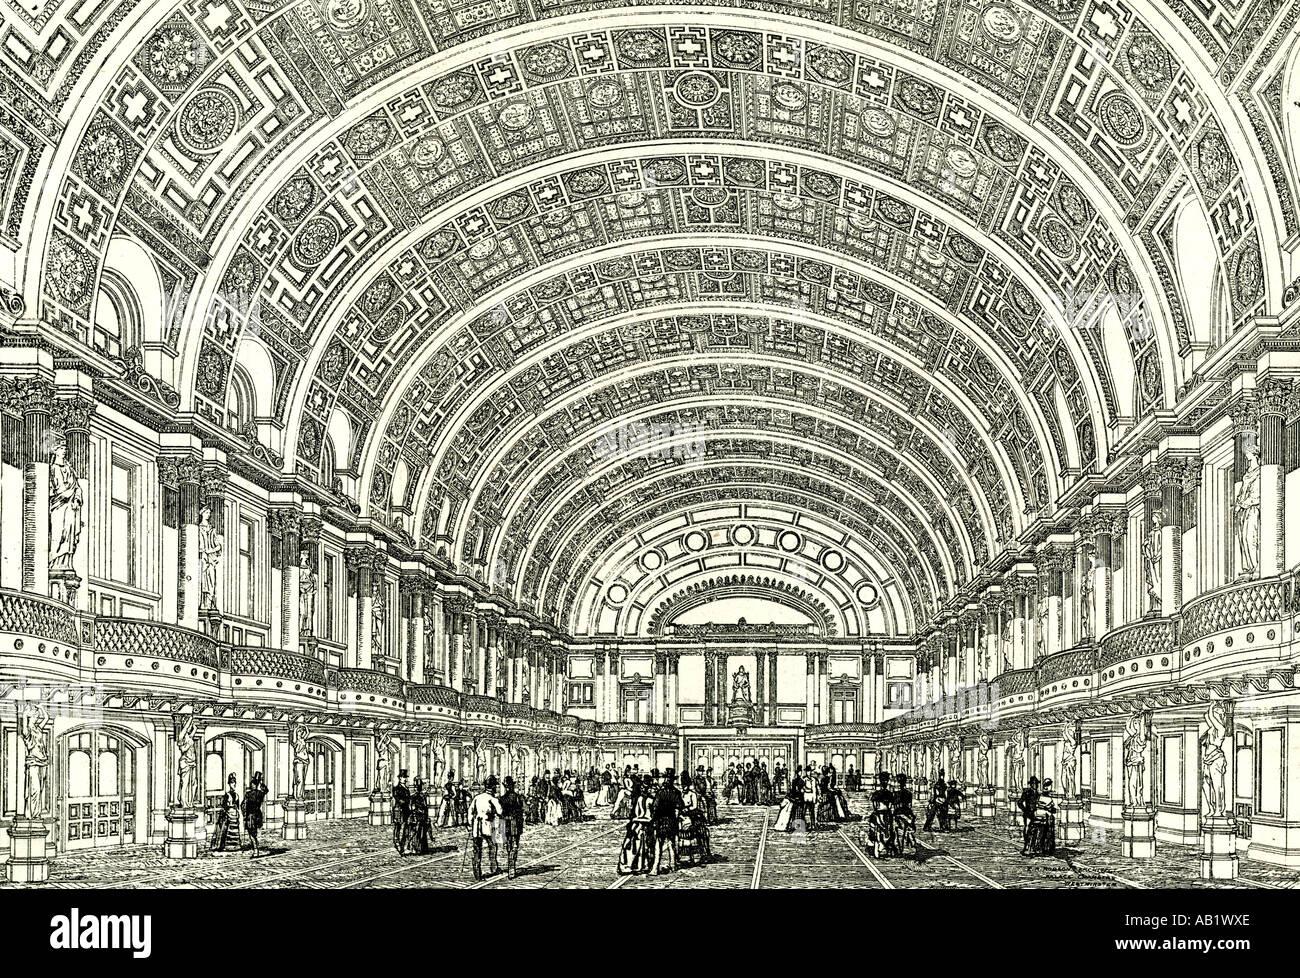 La gente s Palace di Londra U K 1887 la regina s hall aperto da Sua Maestà Londra Immagini Stock